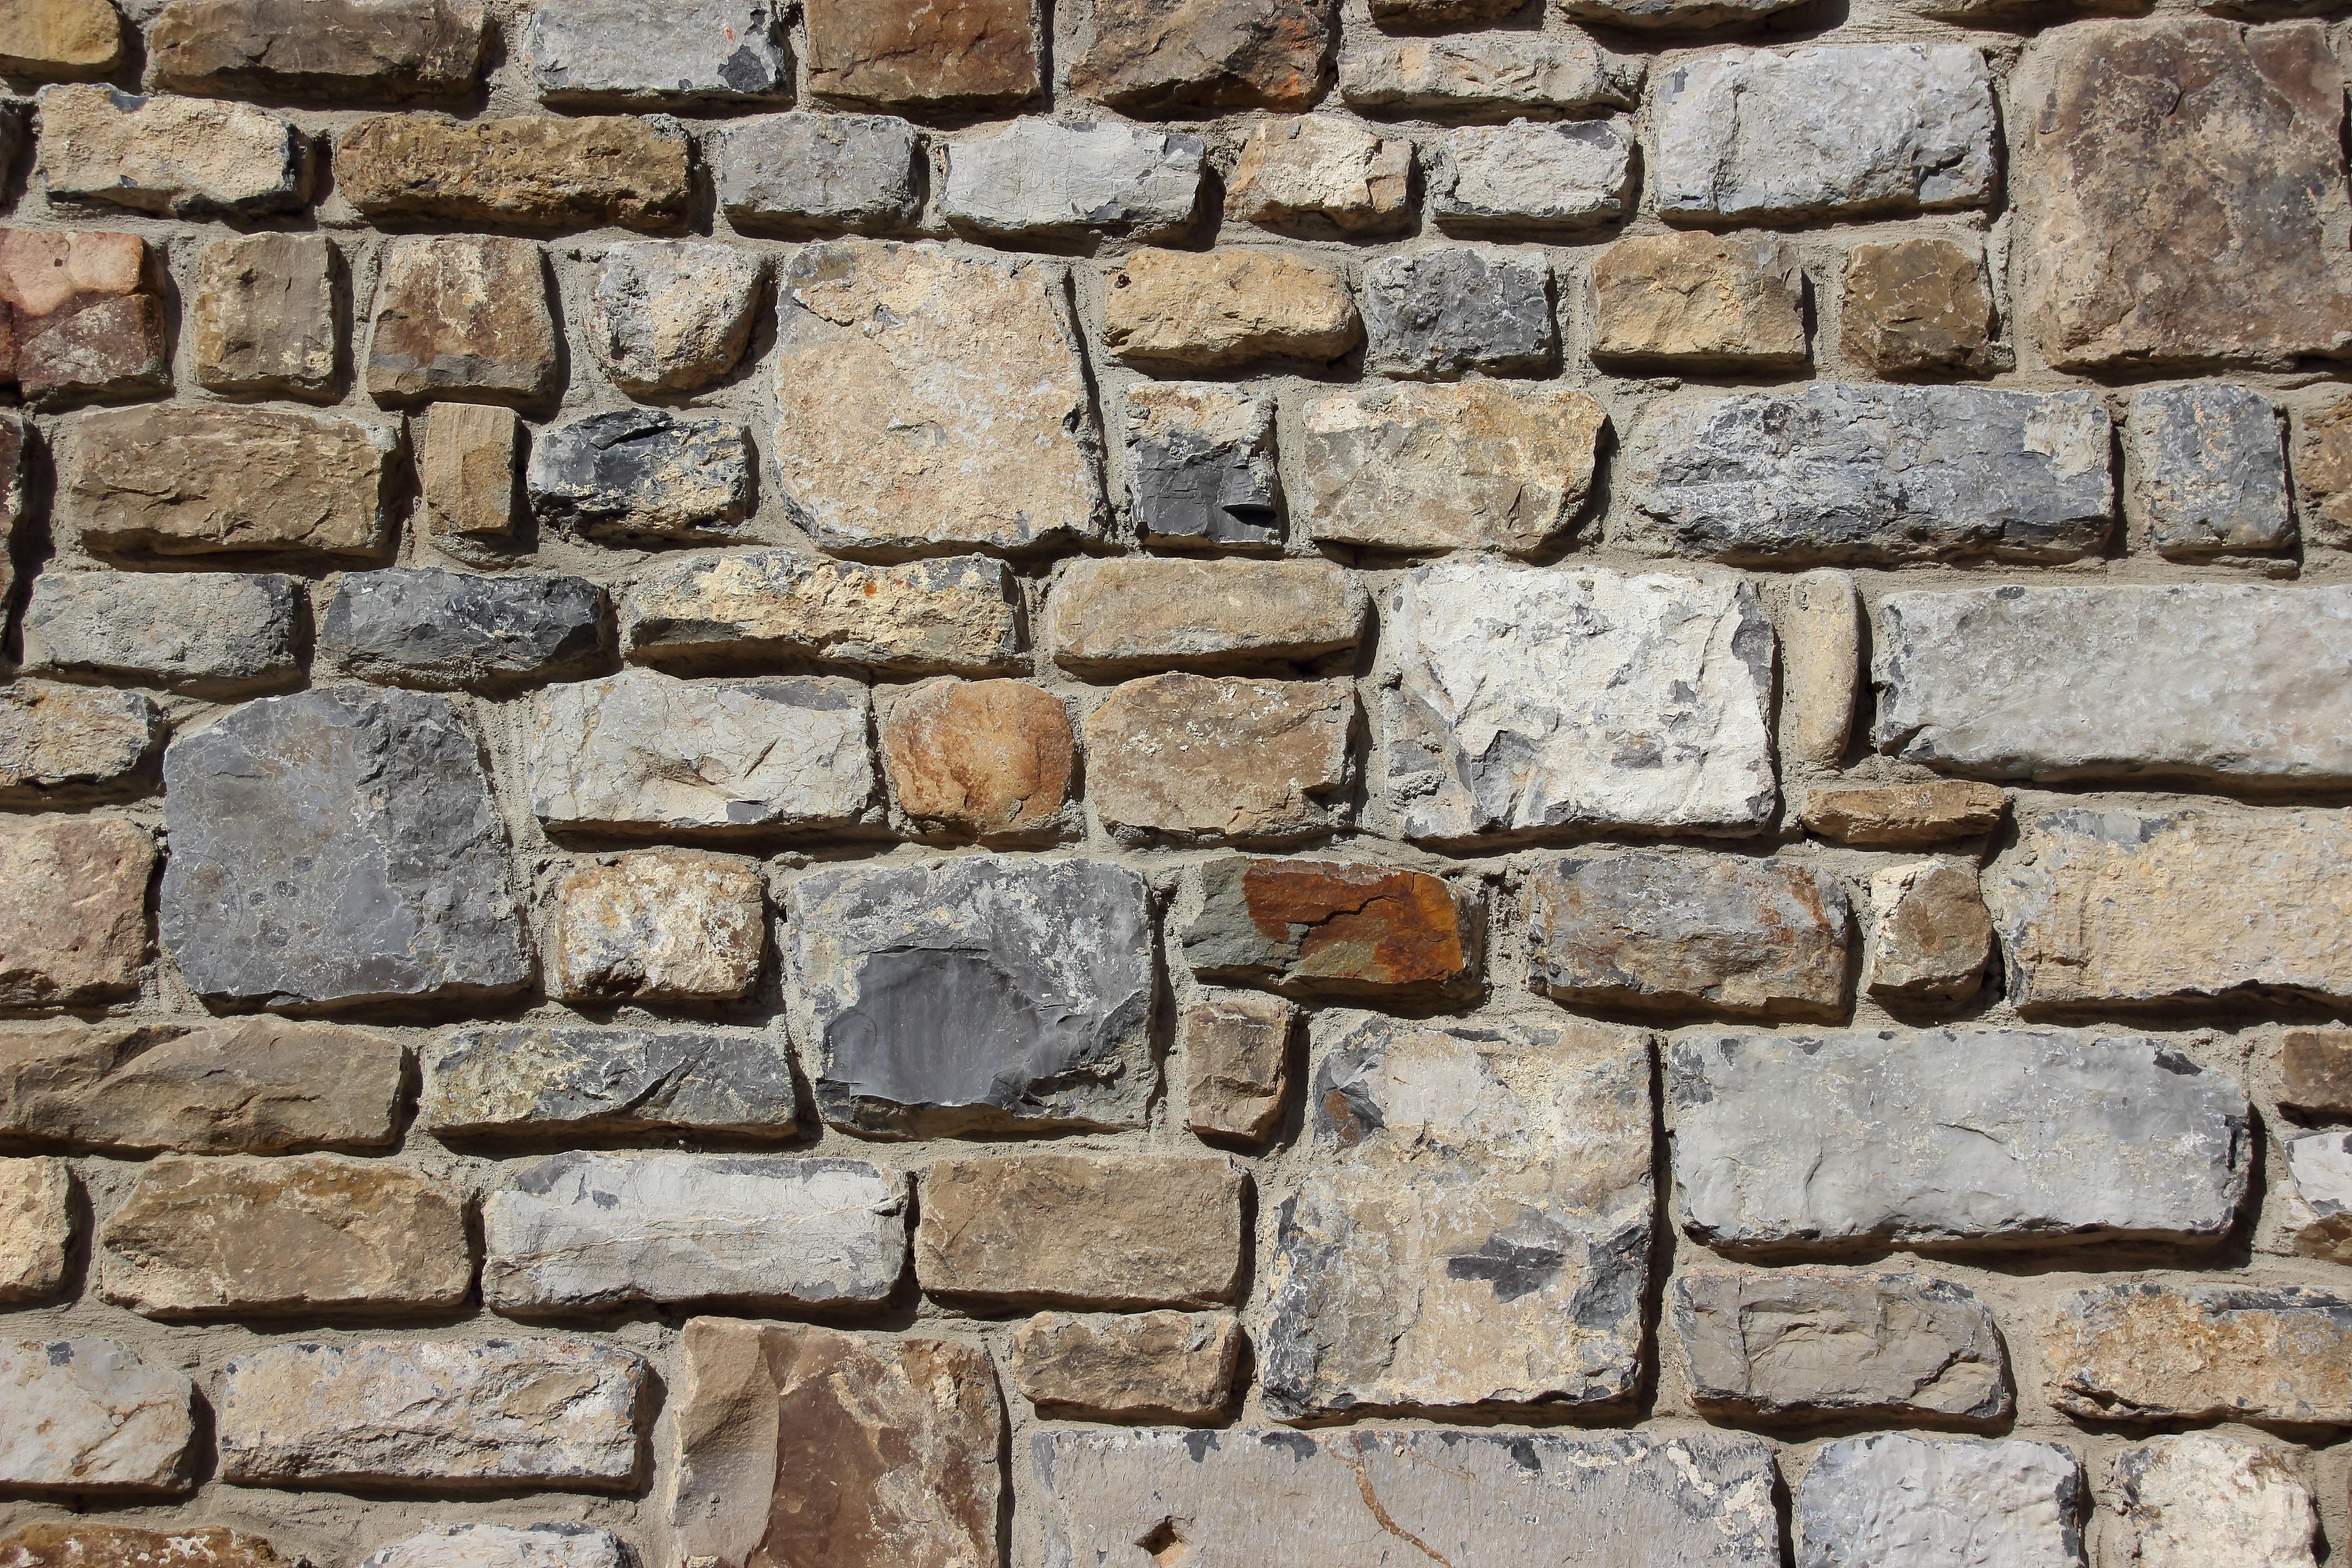 structure texture floor cobblestone wall pattern facade stone wall brick material stones background wallpaper build brickwork masonry natural stone flooring quarry stone regulation 728125 - Steen Behang Wit